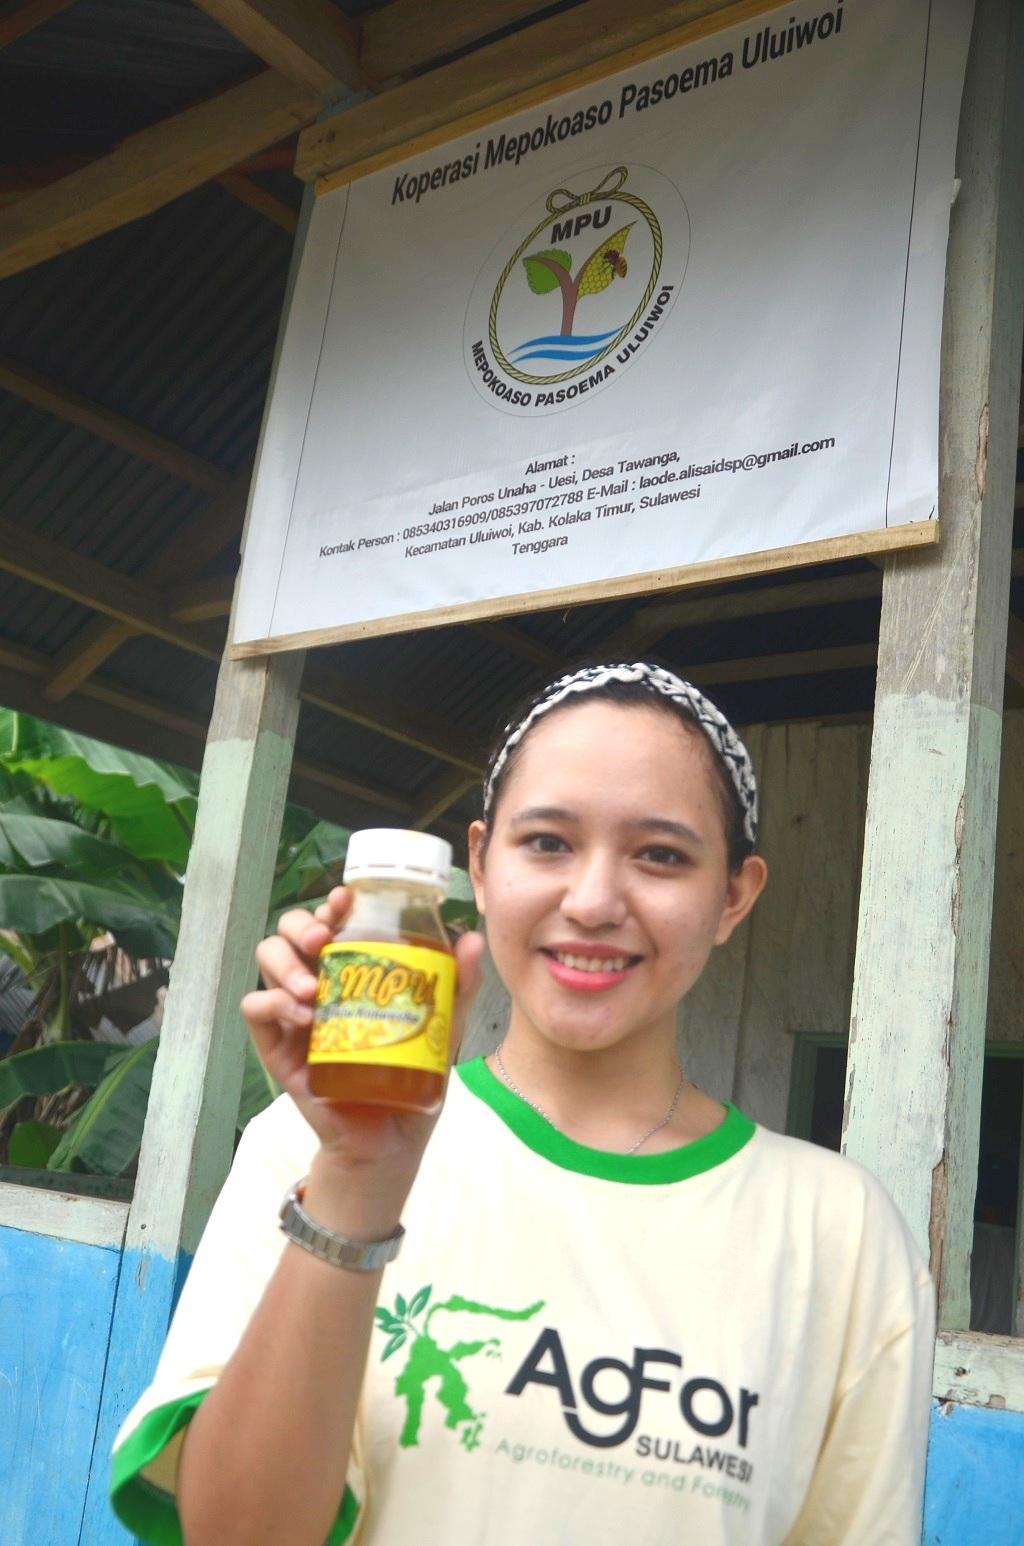 Kini madu produksi  Desa Tawanga, Kecamatan Uluiwoi, Kabupaten Kolaka Timur, Sulawesi Tenggara sudah dikemas dalam botol 100 gr, 250 gr hingga 500 gr. Pemasarannya juga sudah lintas kabupaten, dan dipasarkan di berbagai tempat. Foto: wahyu Chandra